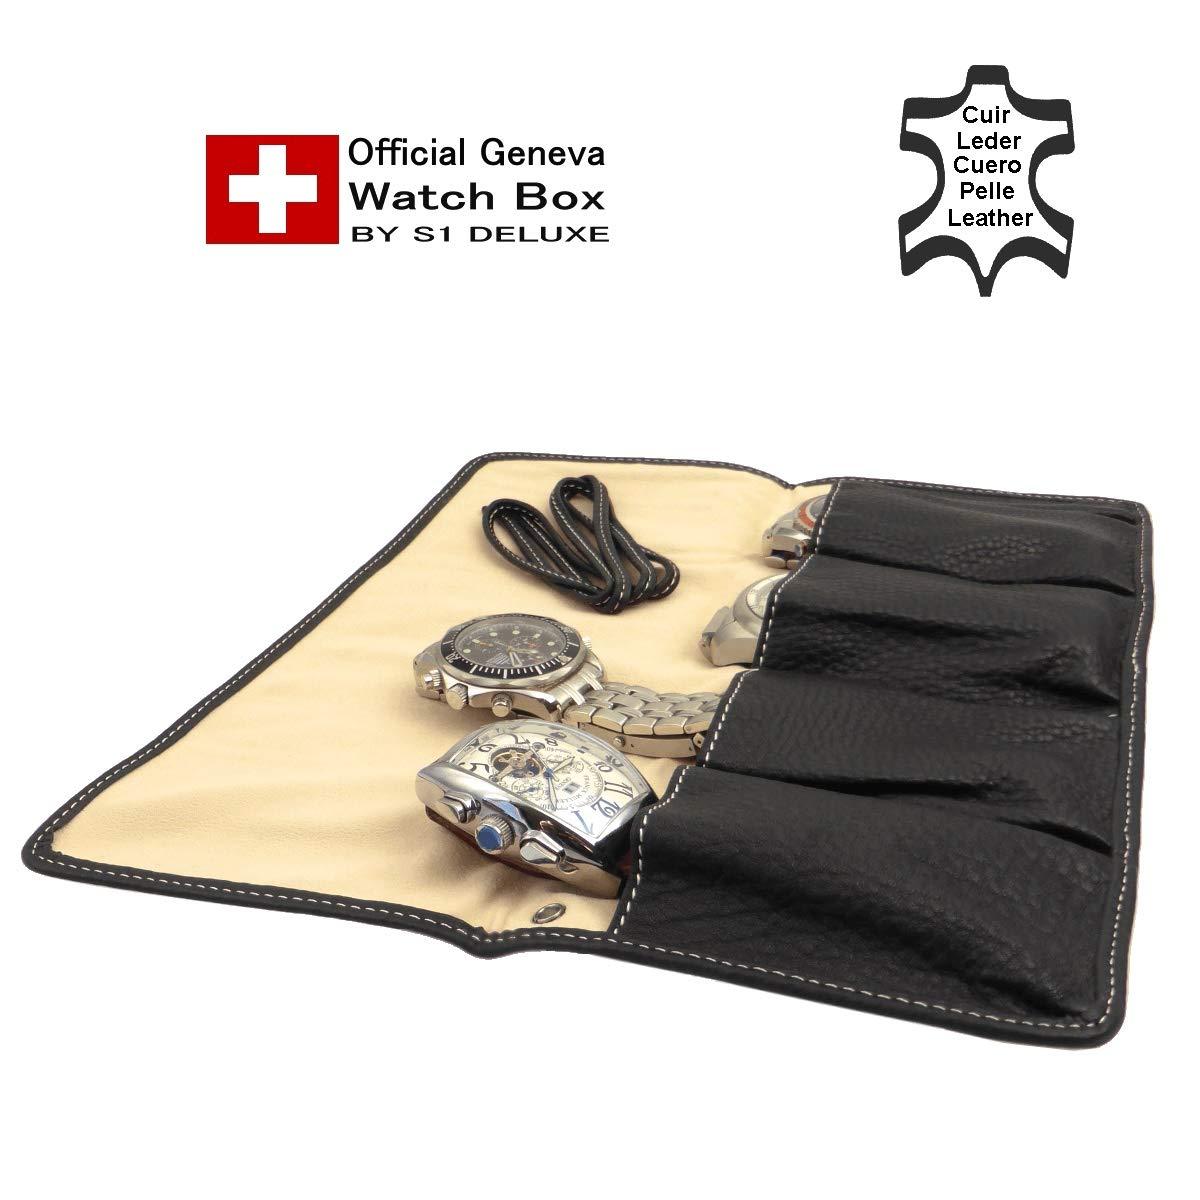 Official Luxowa Schwarzen Top Uhrenrolle Geneva In LederZur Soften 54jRLc3Aq